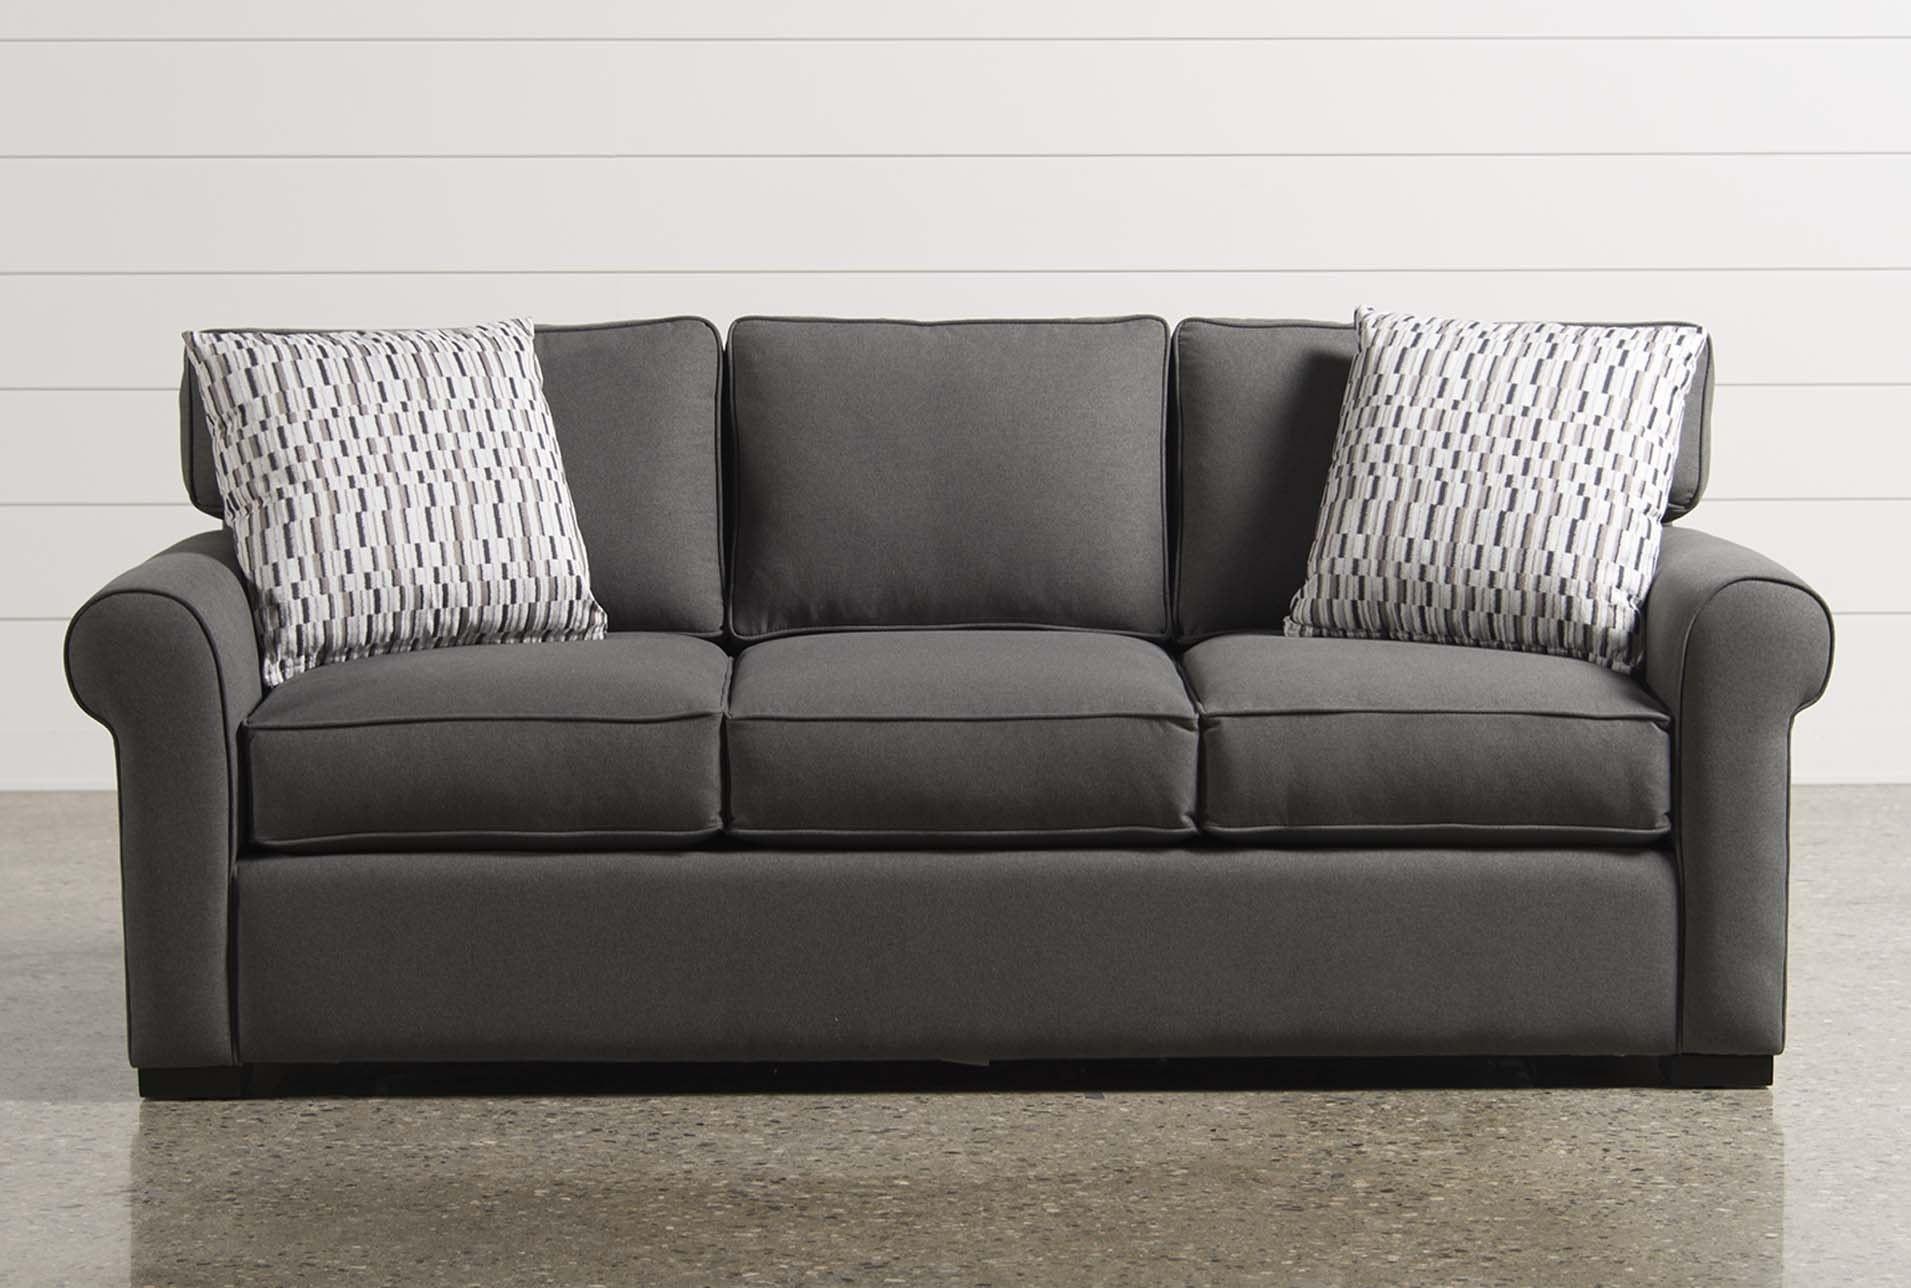 Memory Foam Queen Sleeper, Mia, Grey, Sofas | Living Spaces, Memory Regarding Taren Reversible Sofa/chaise Sleeper Sectionals With Storage Ottoman (Image 13 of 25)